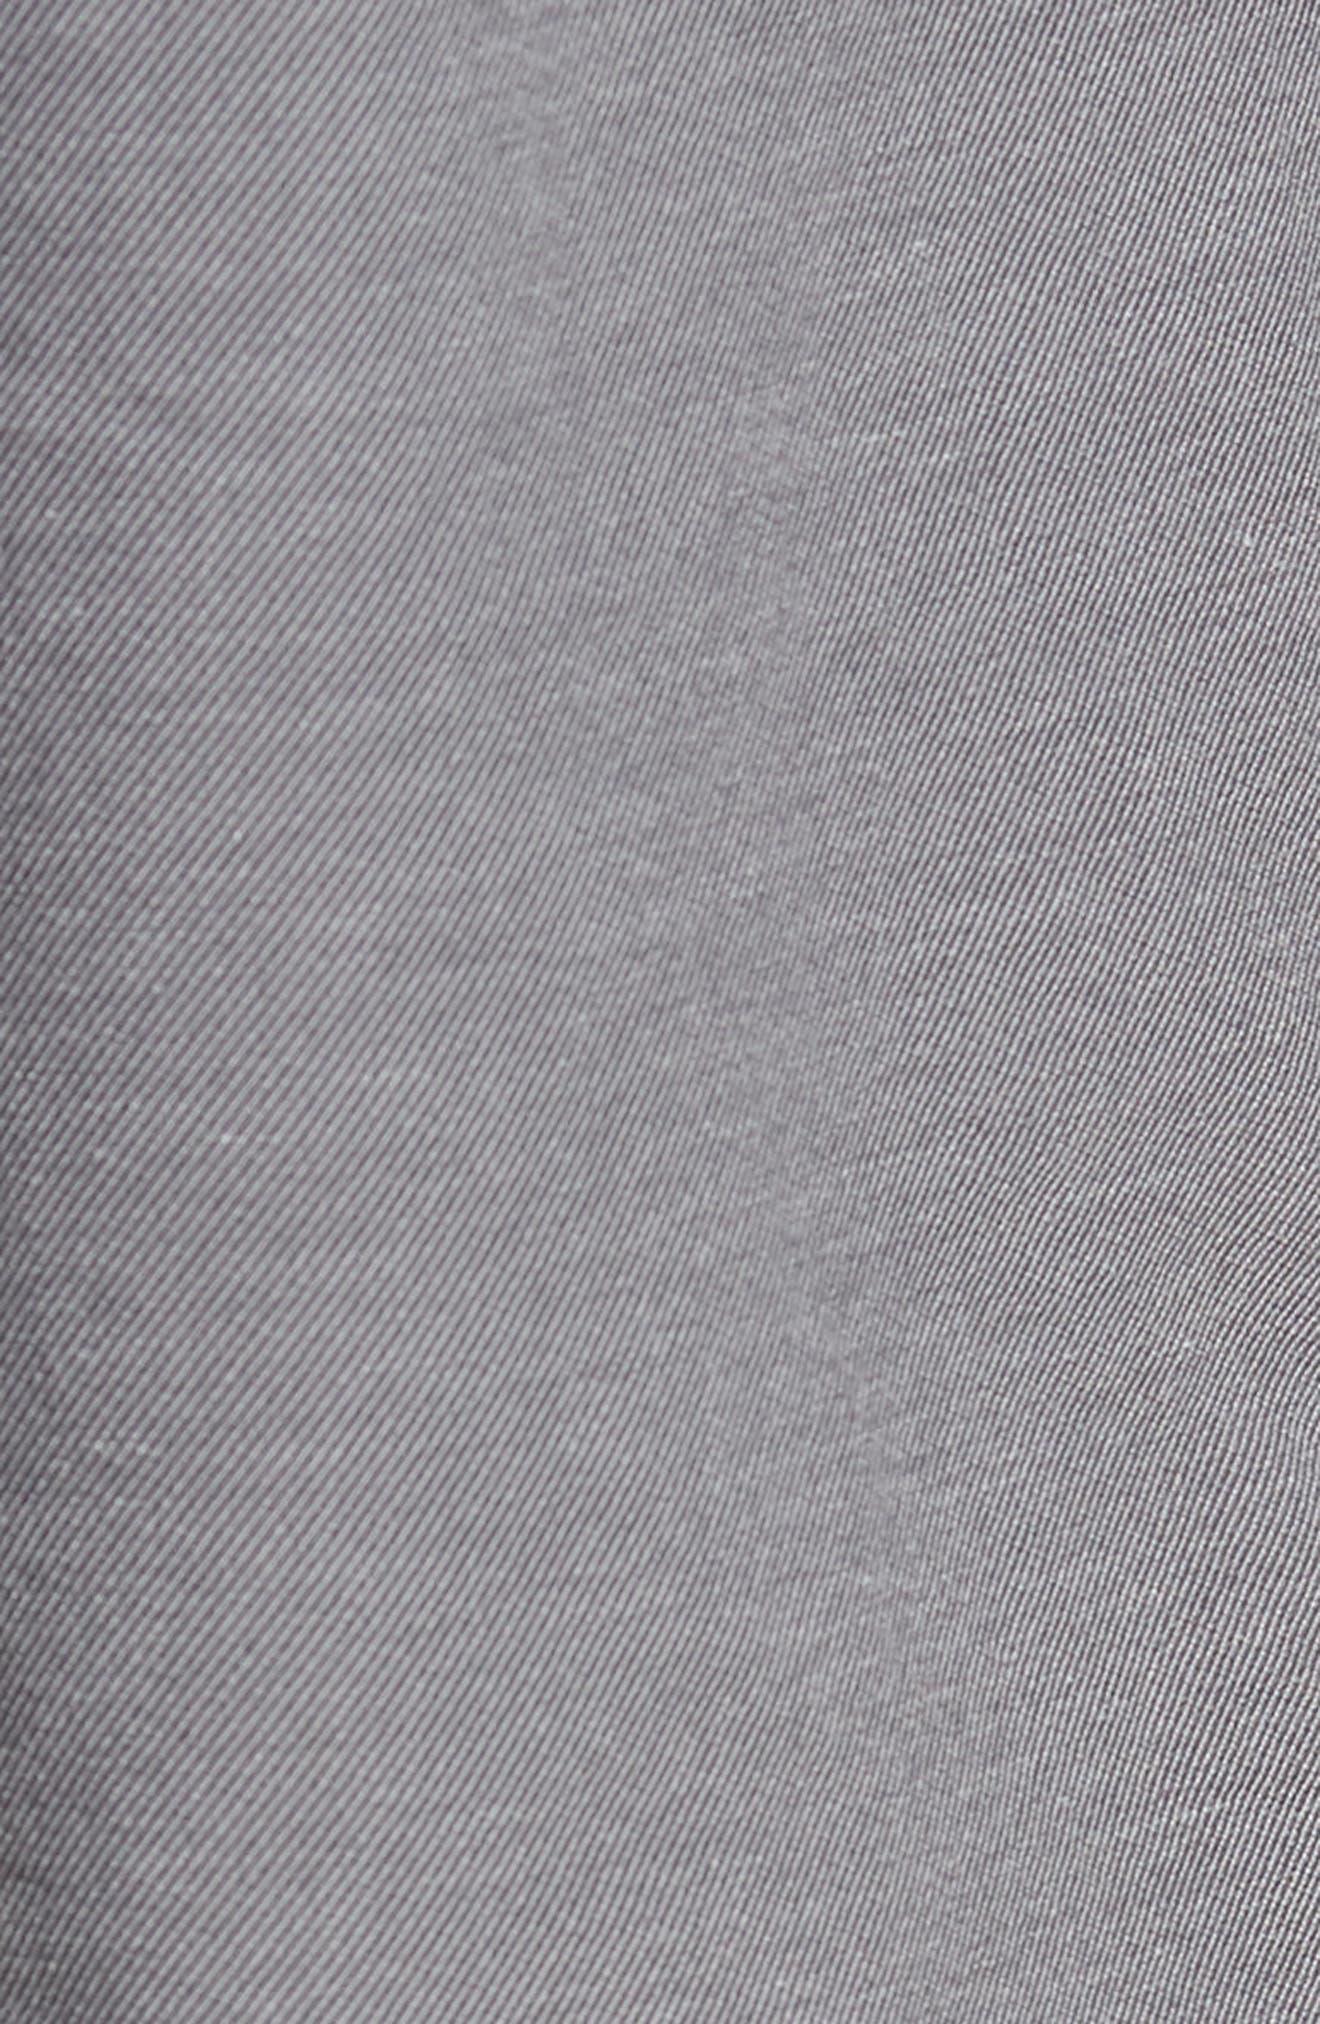 Passport Regular Fit Pants,                             Alternate thumbnail 5, color,                             GRAPHITE